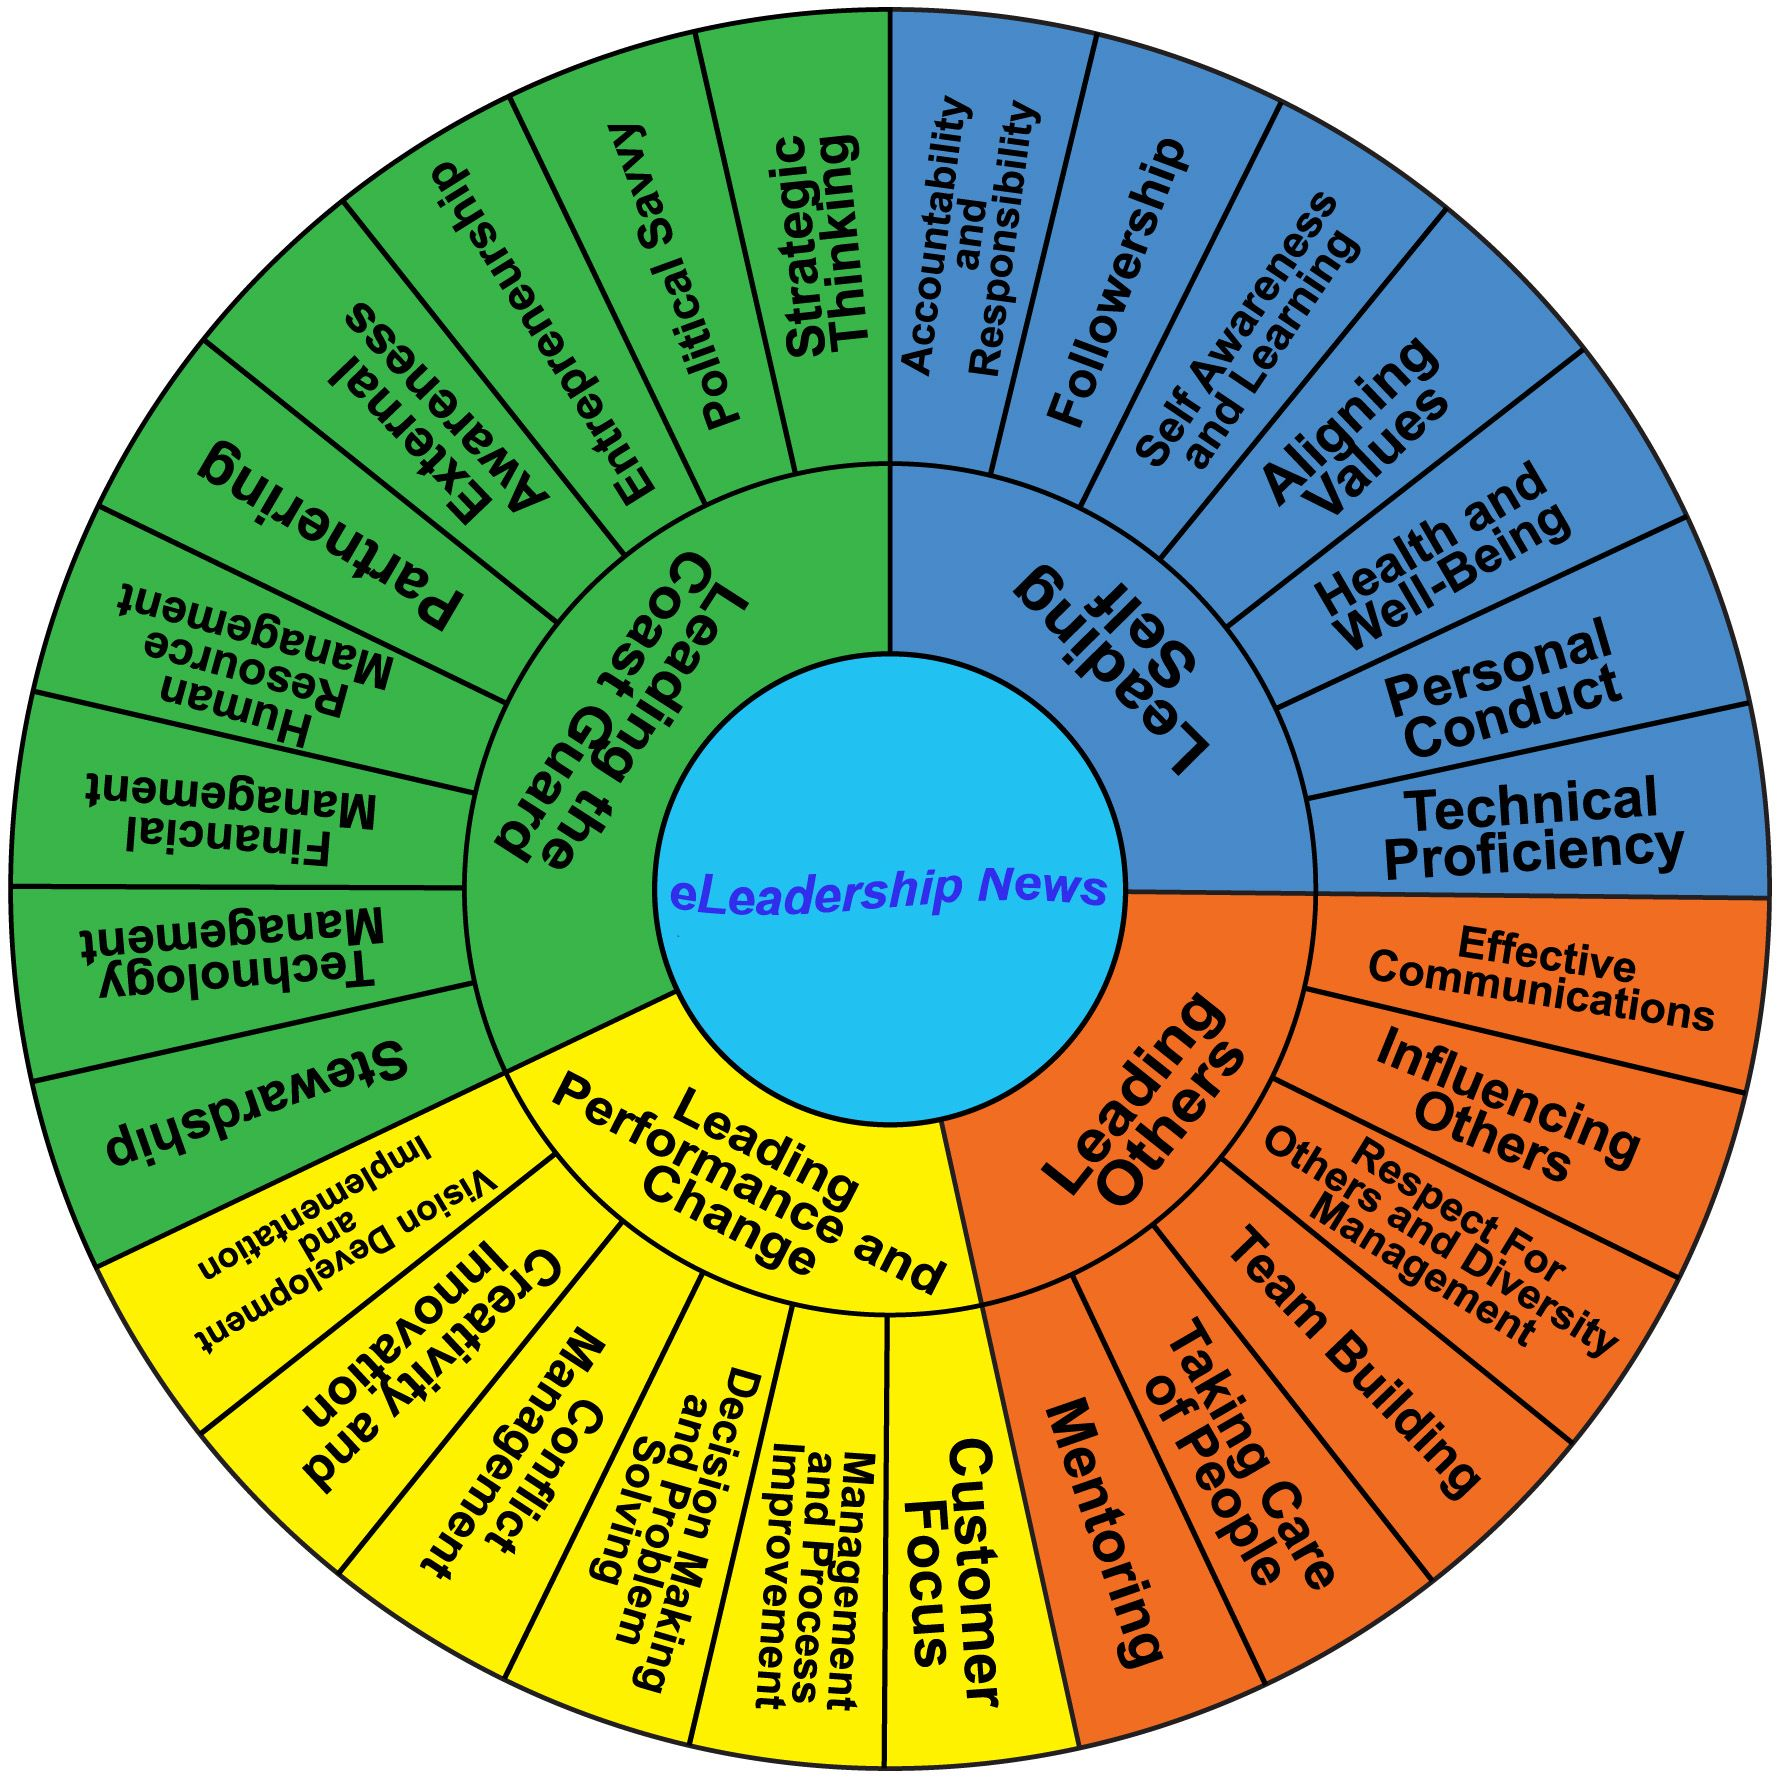 lominger competency framework coaching tools and models lominger competency framework